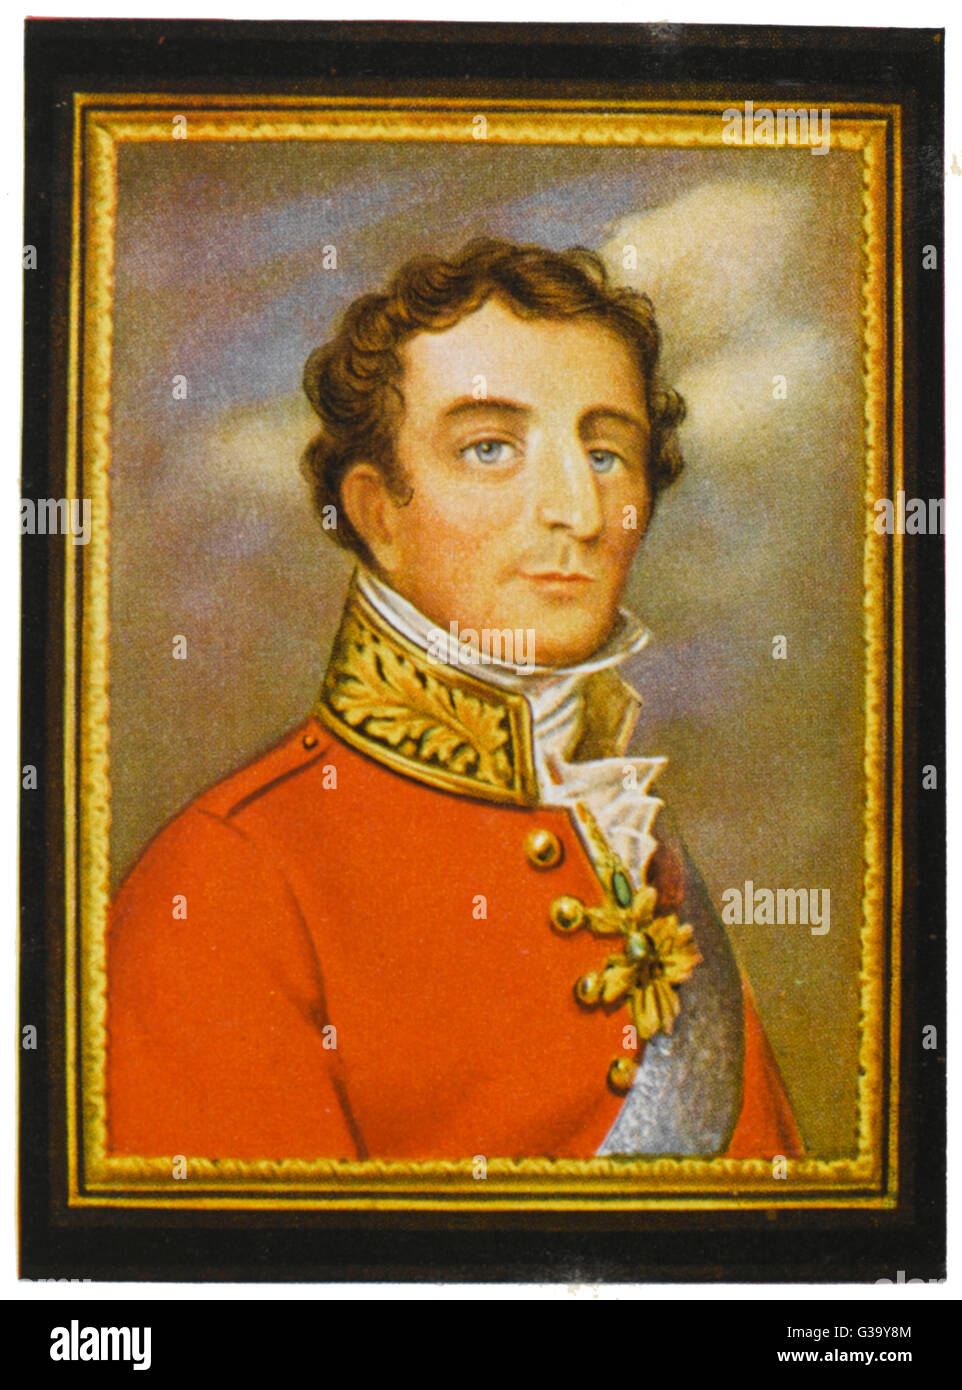 Arthur Wellesley, duke of  Wellington, soldier and  statesman        Date: 1769 - 1852 - Stock Image